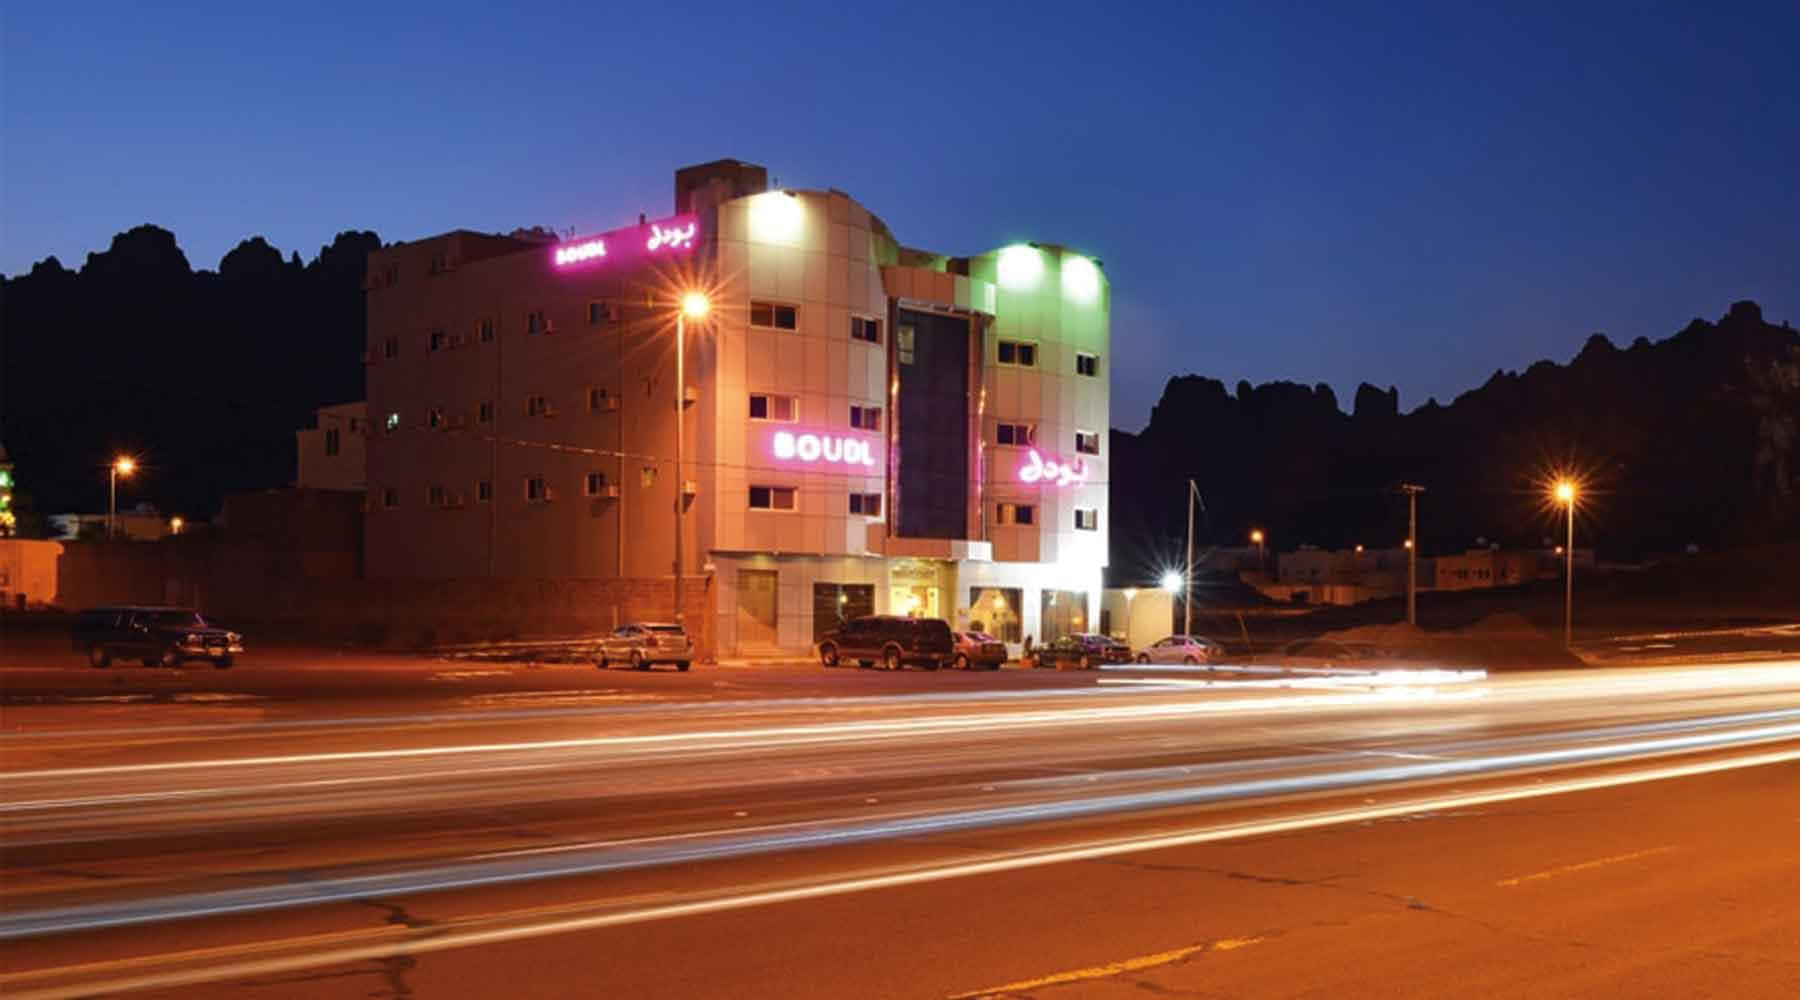 Boudl Bondoqia Hotel